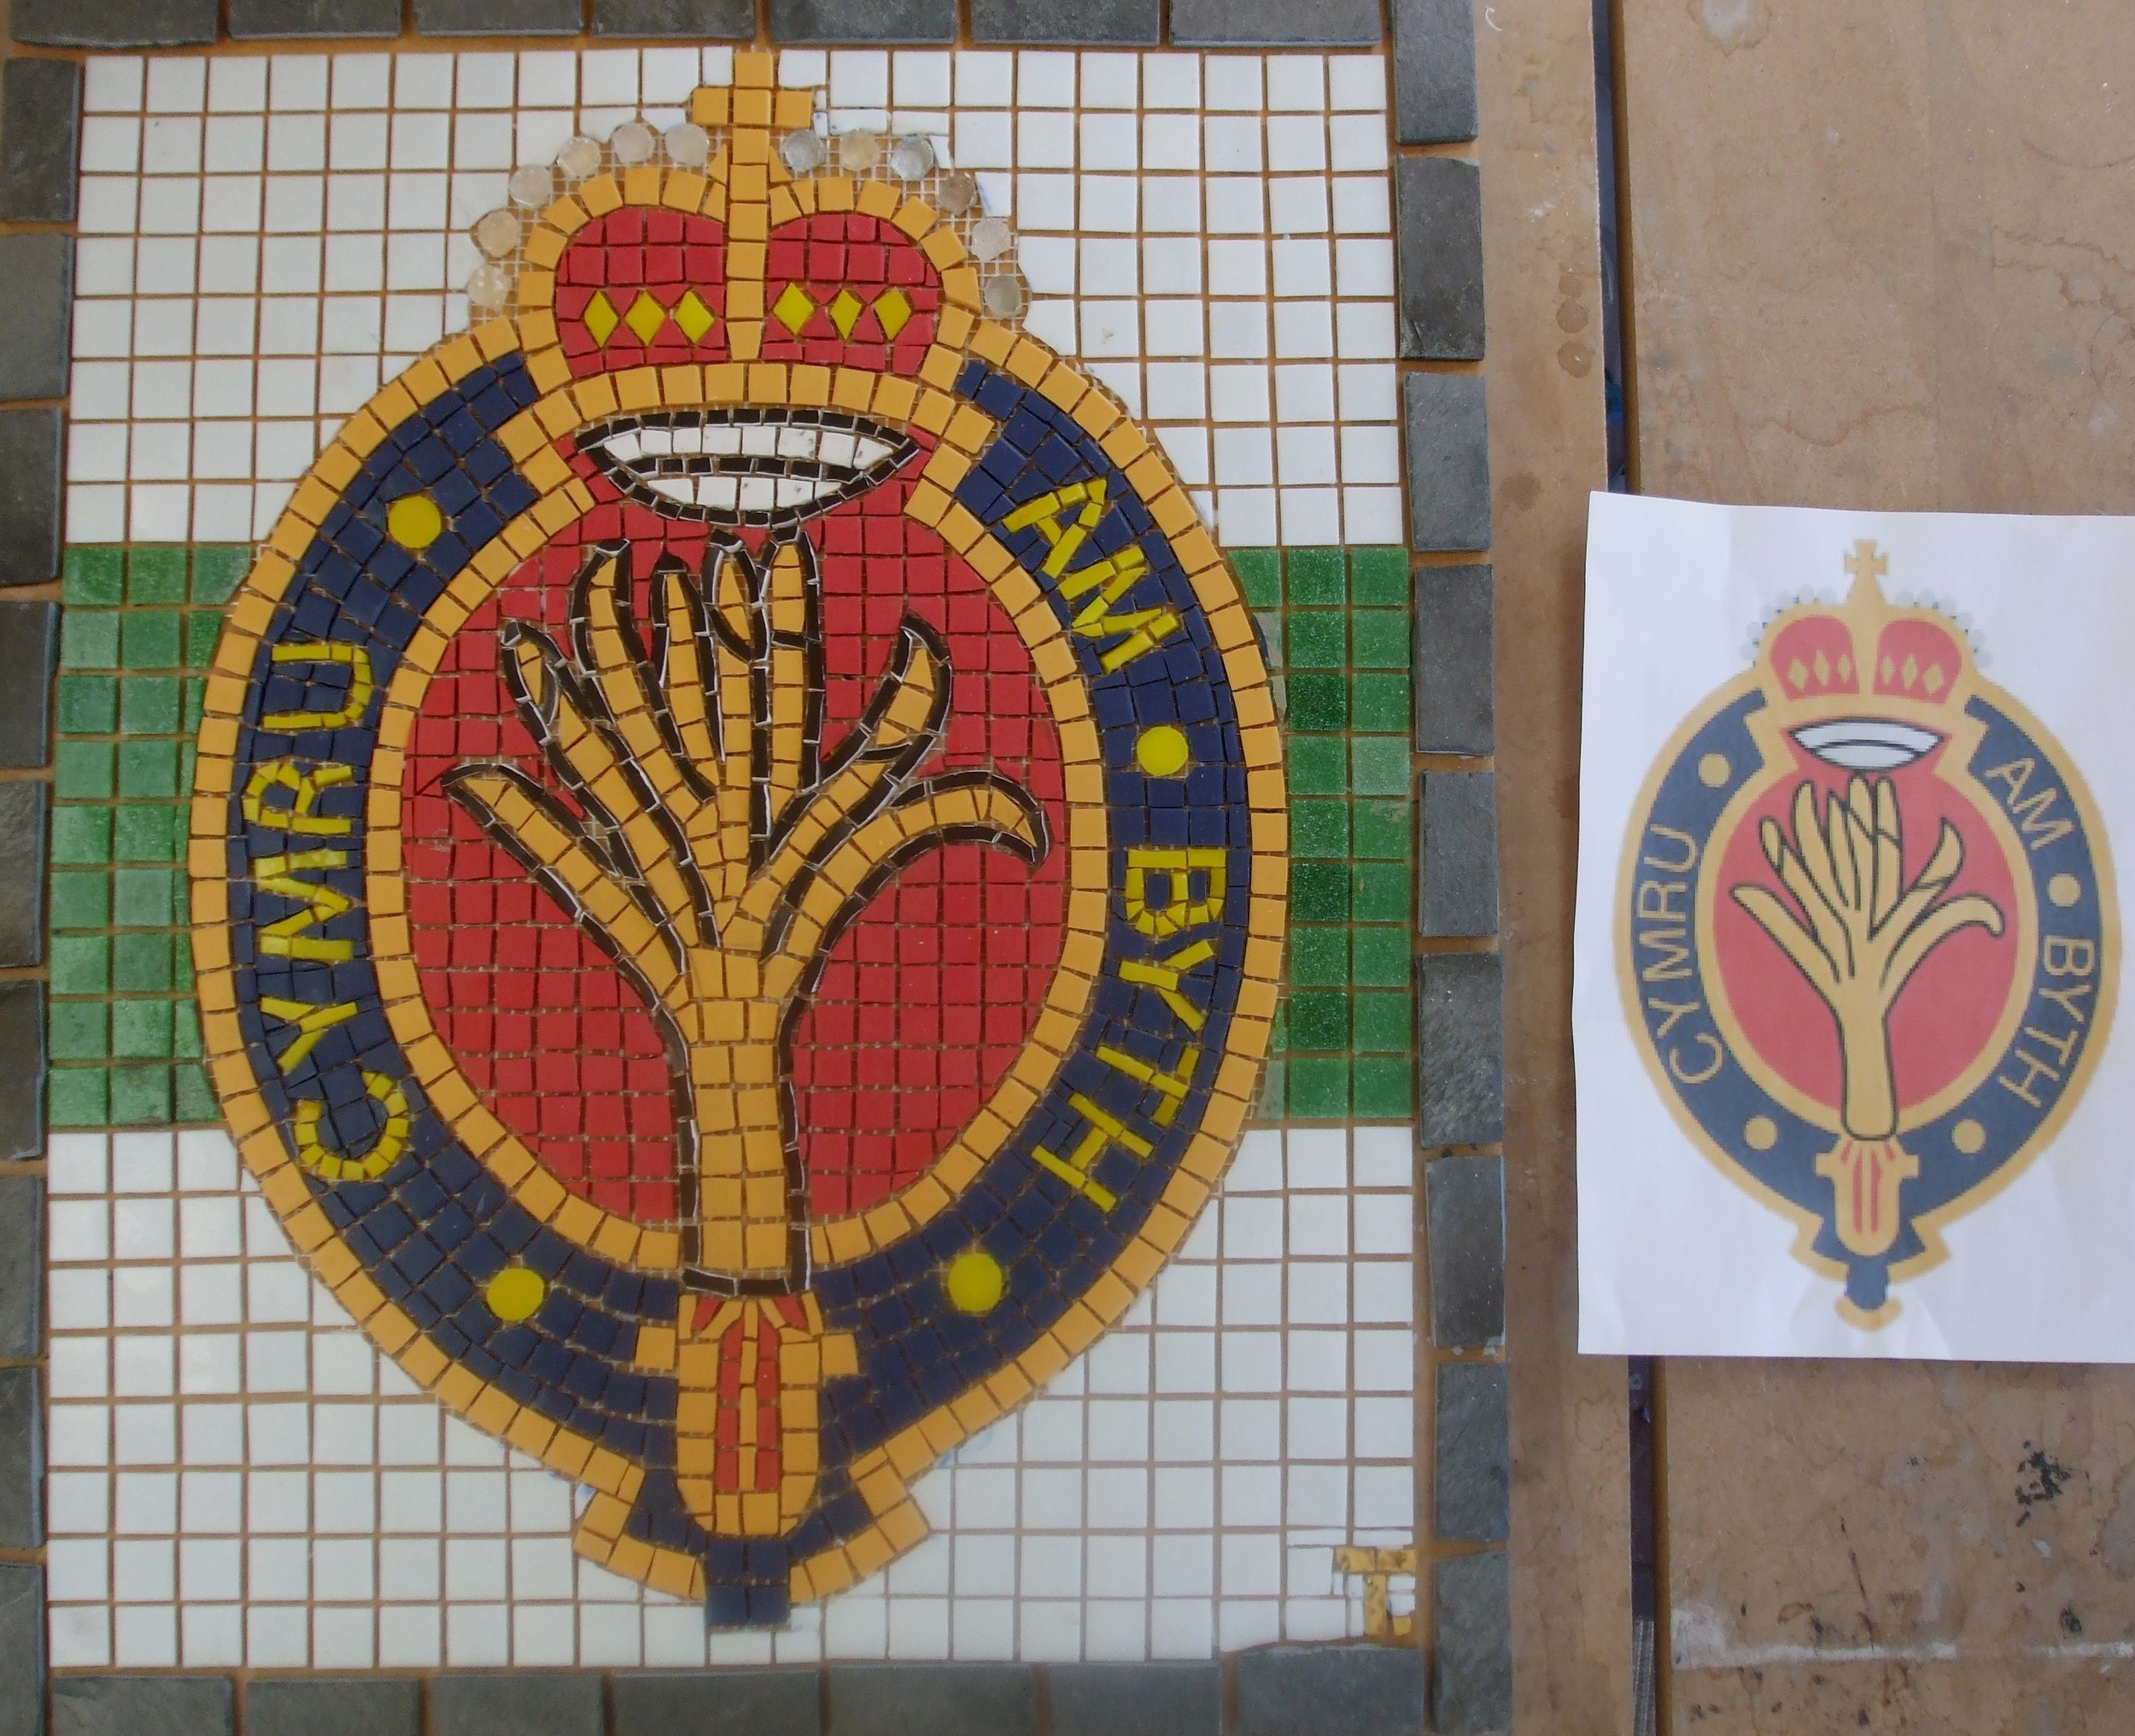 Badge of the Welsh Guards. Commission for the Regiment HQ at Pirbright, UK. Materials: Vitreous glass, matt porcelain, glass beads, Welsh slate, goldleaf glass